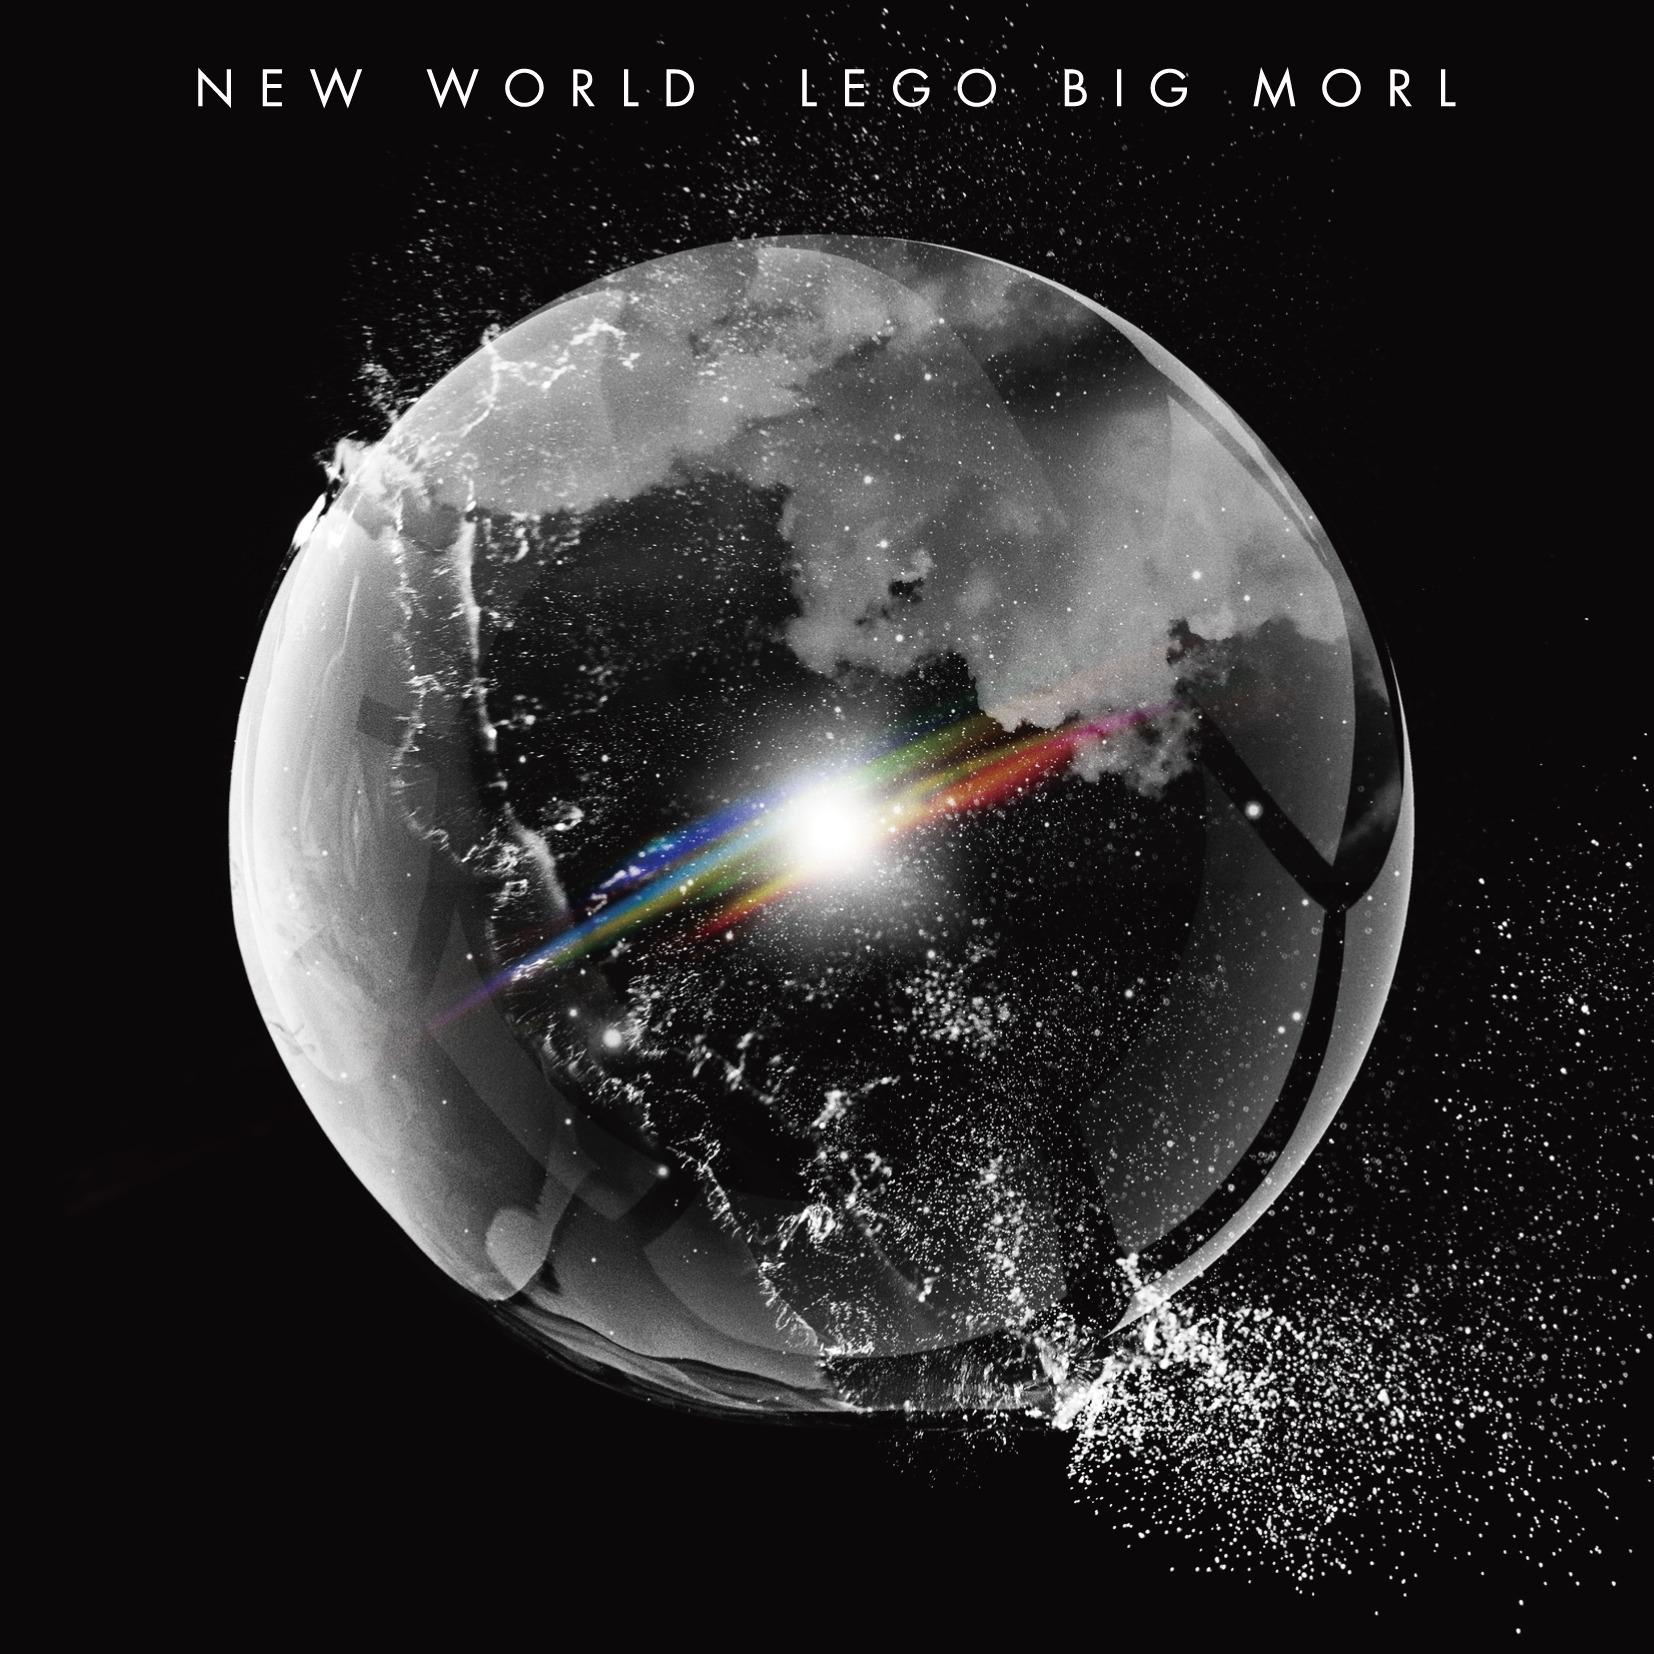 Lego_newworld_jk